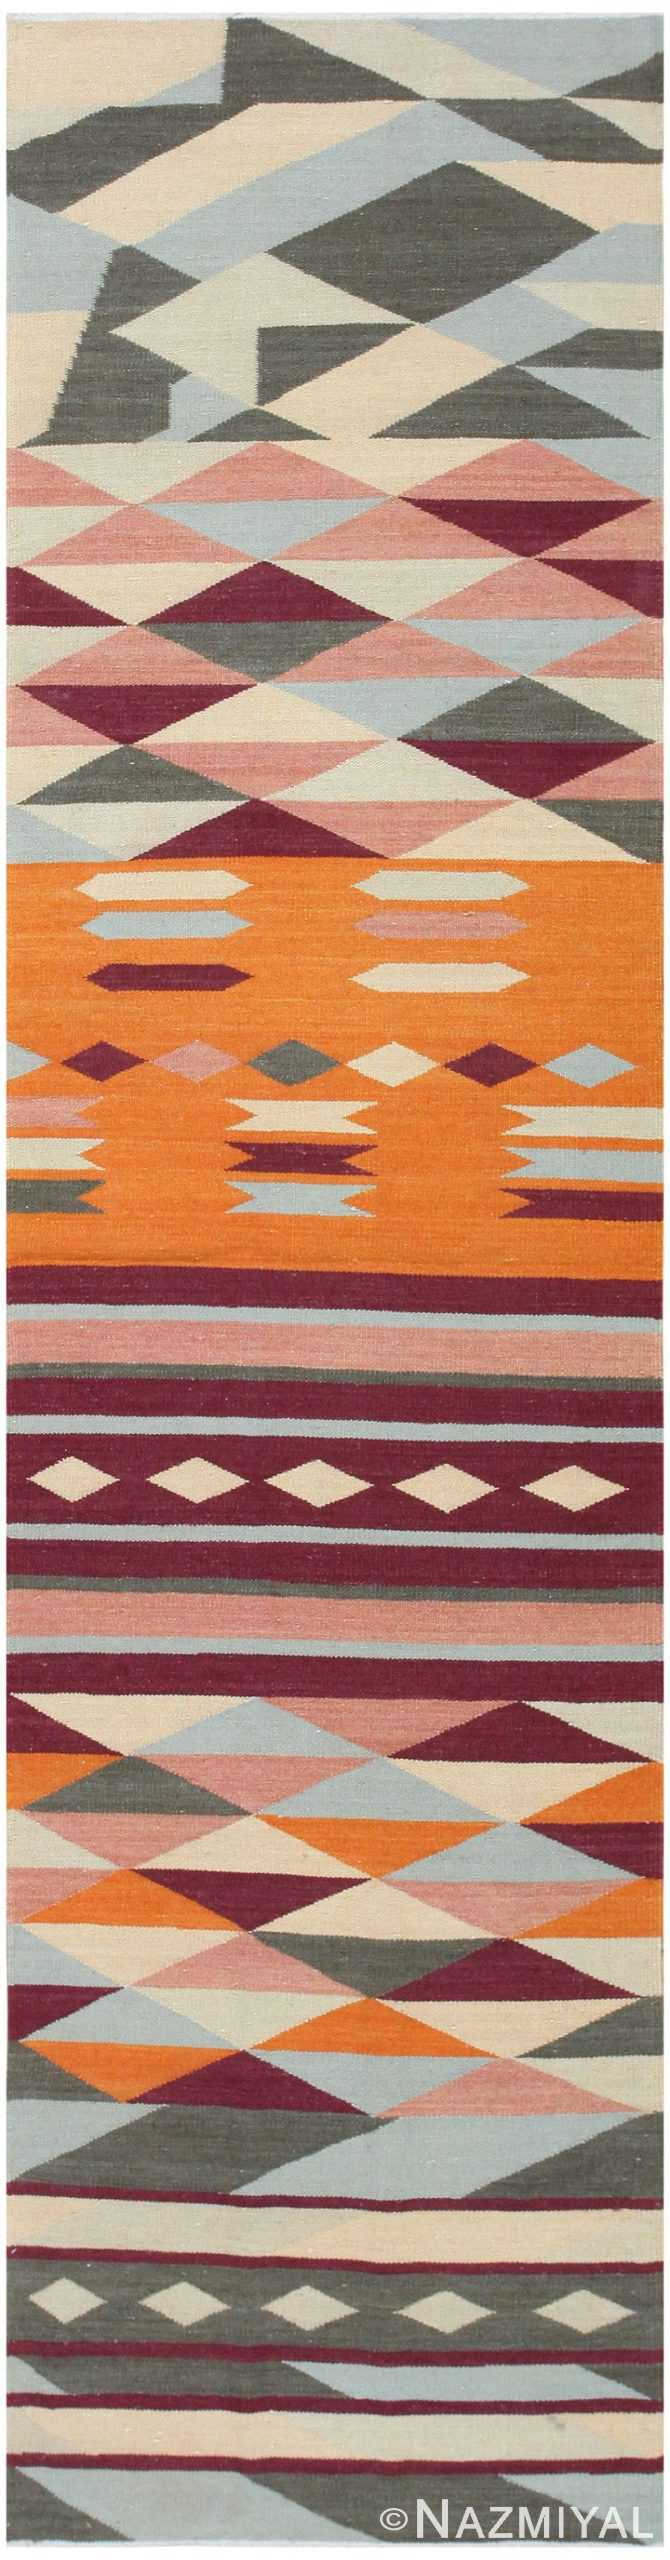 Swedish Inspired Carpet 48475 Nazmiyal